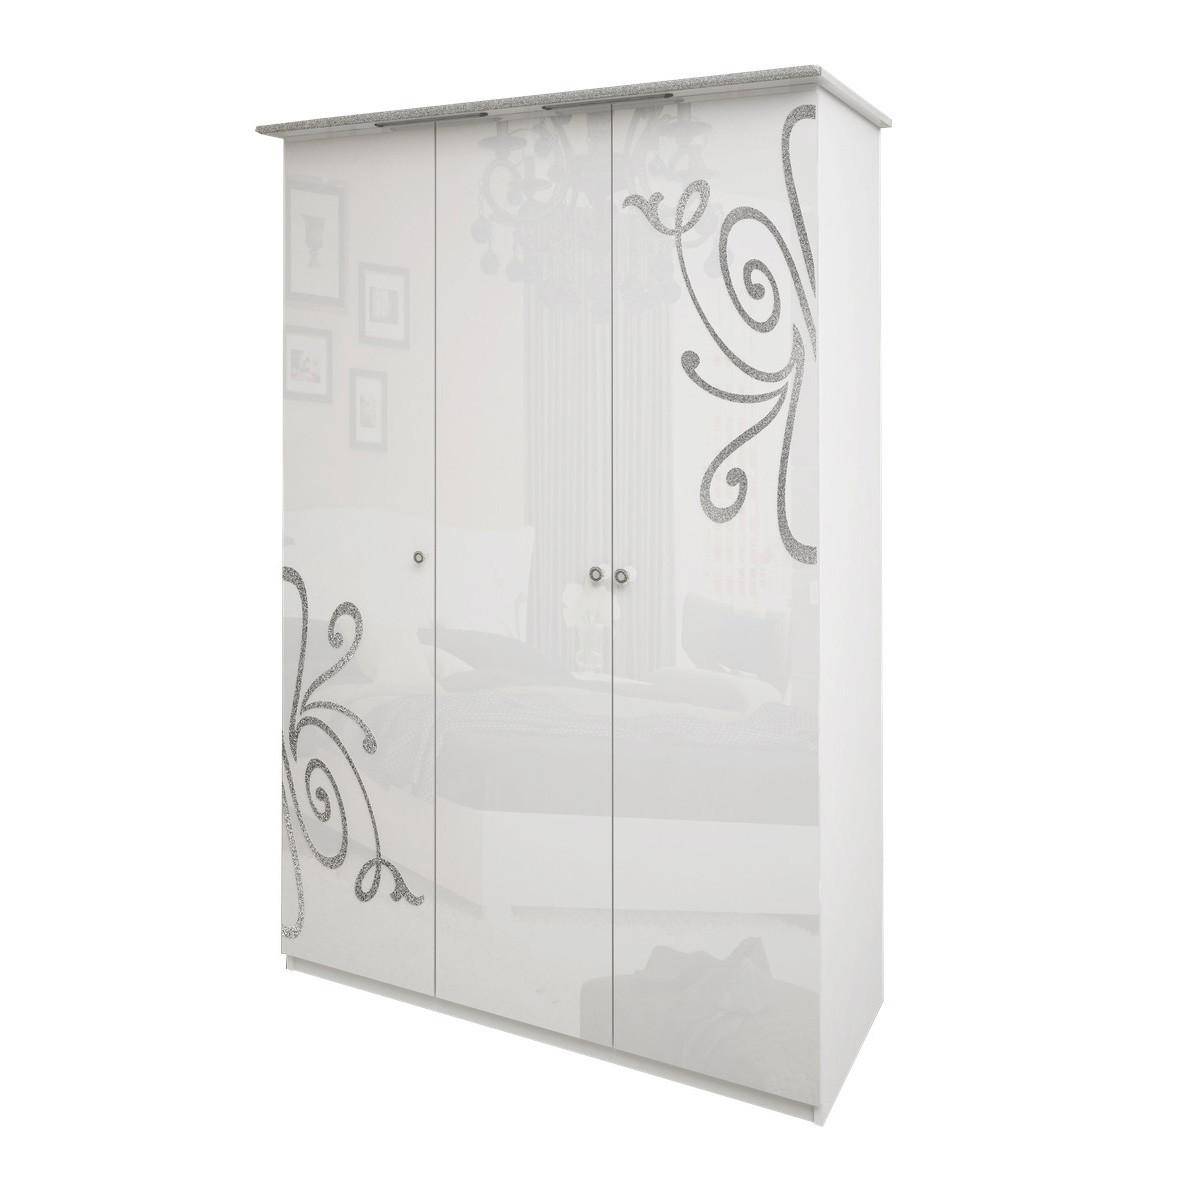 Шкаф распашной в спальню, в прихожую Богема 3Д BG-23-WB MiroMark белый глянец (без зеркал)